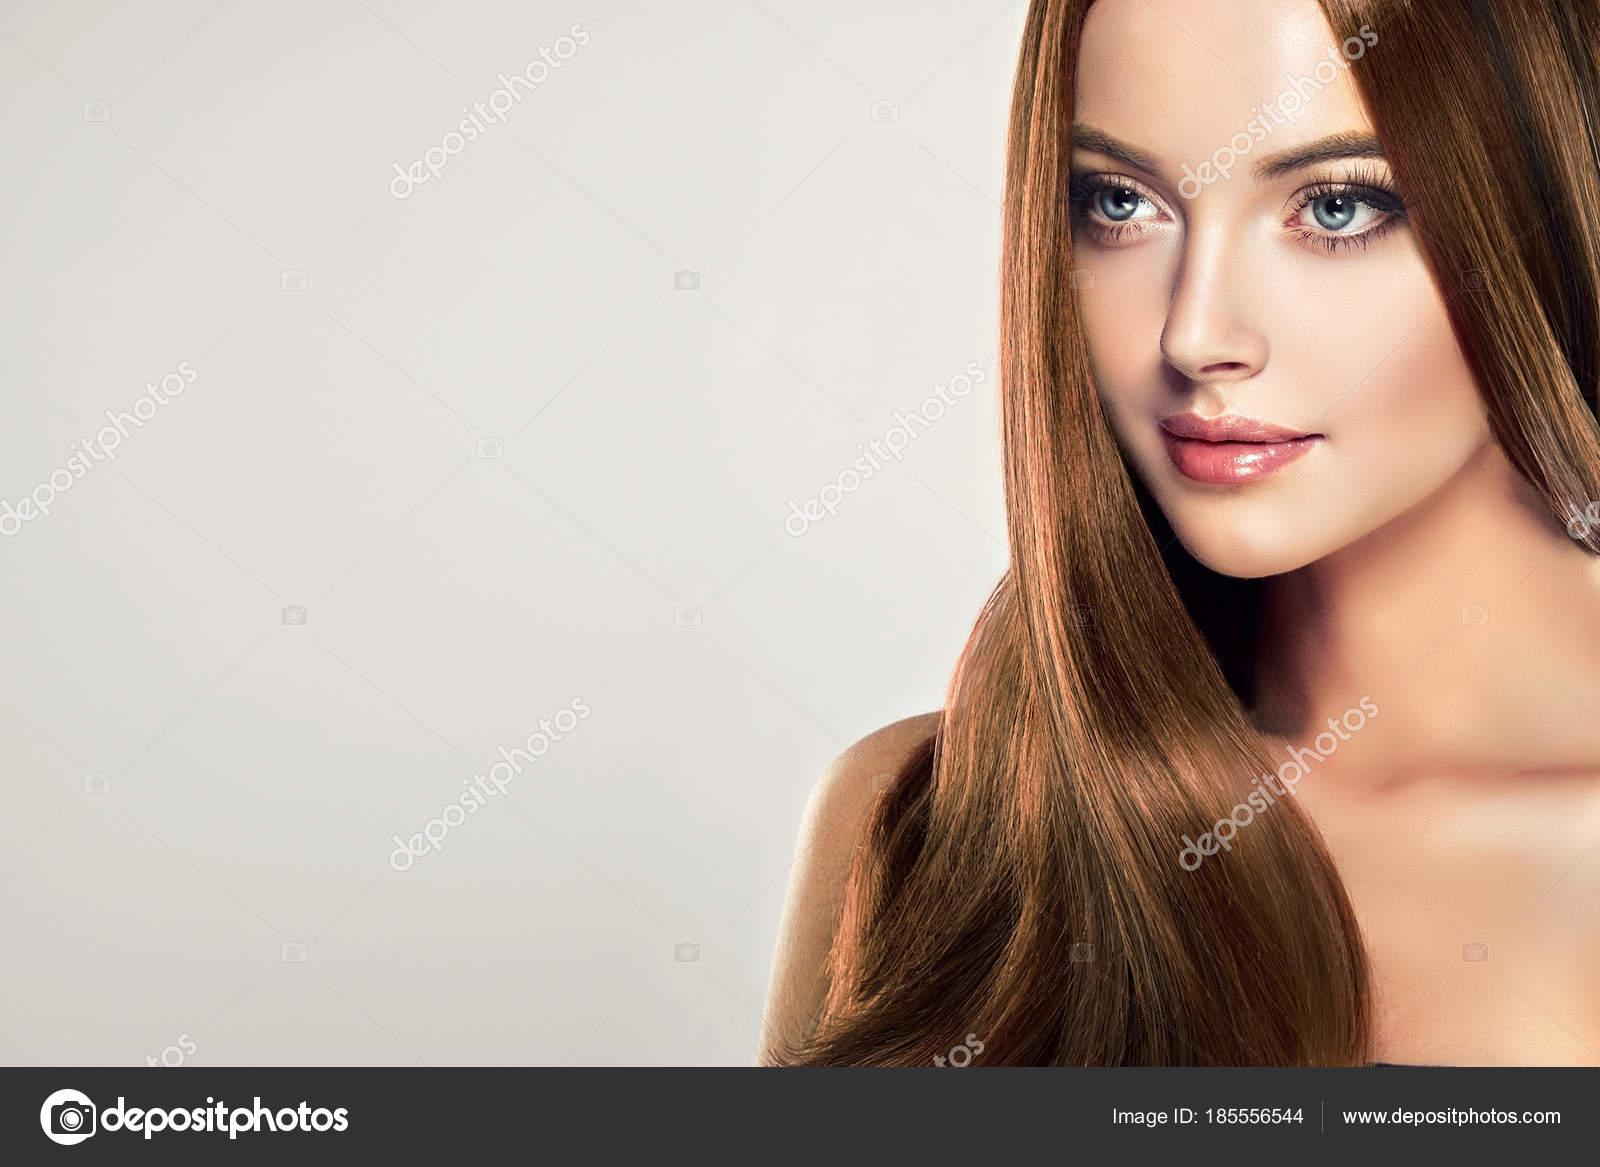 Beautiful Model Girl Shiny Brown Straight Long Hair Keratin Straightening — Stock Photo